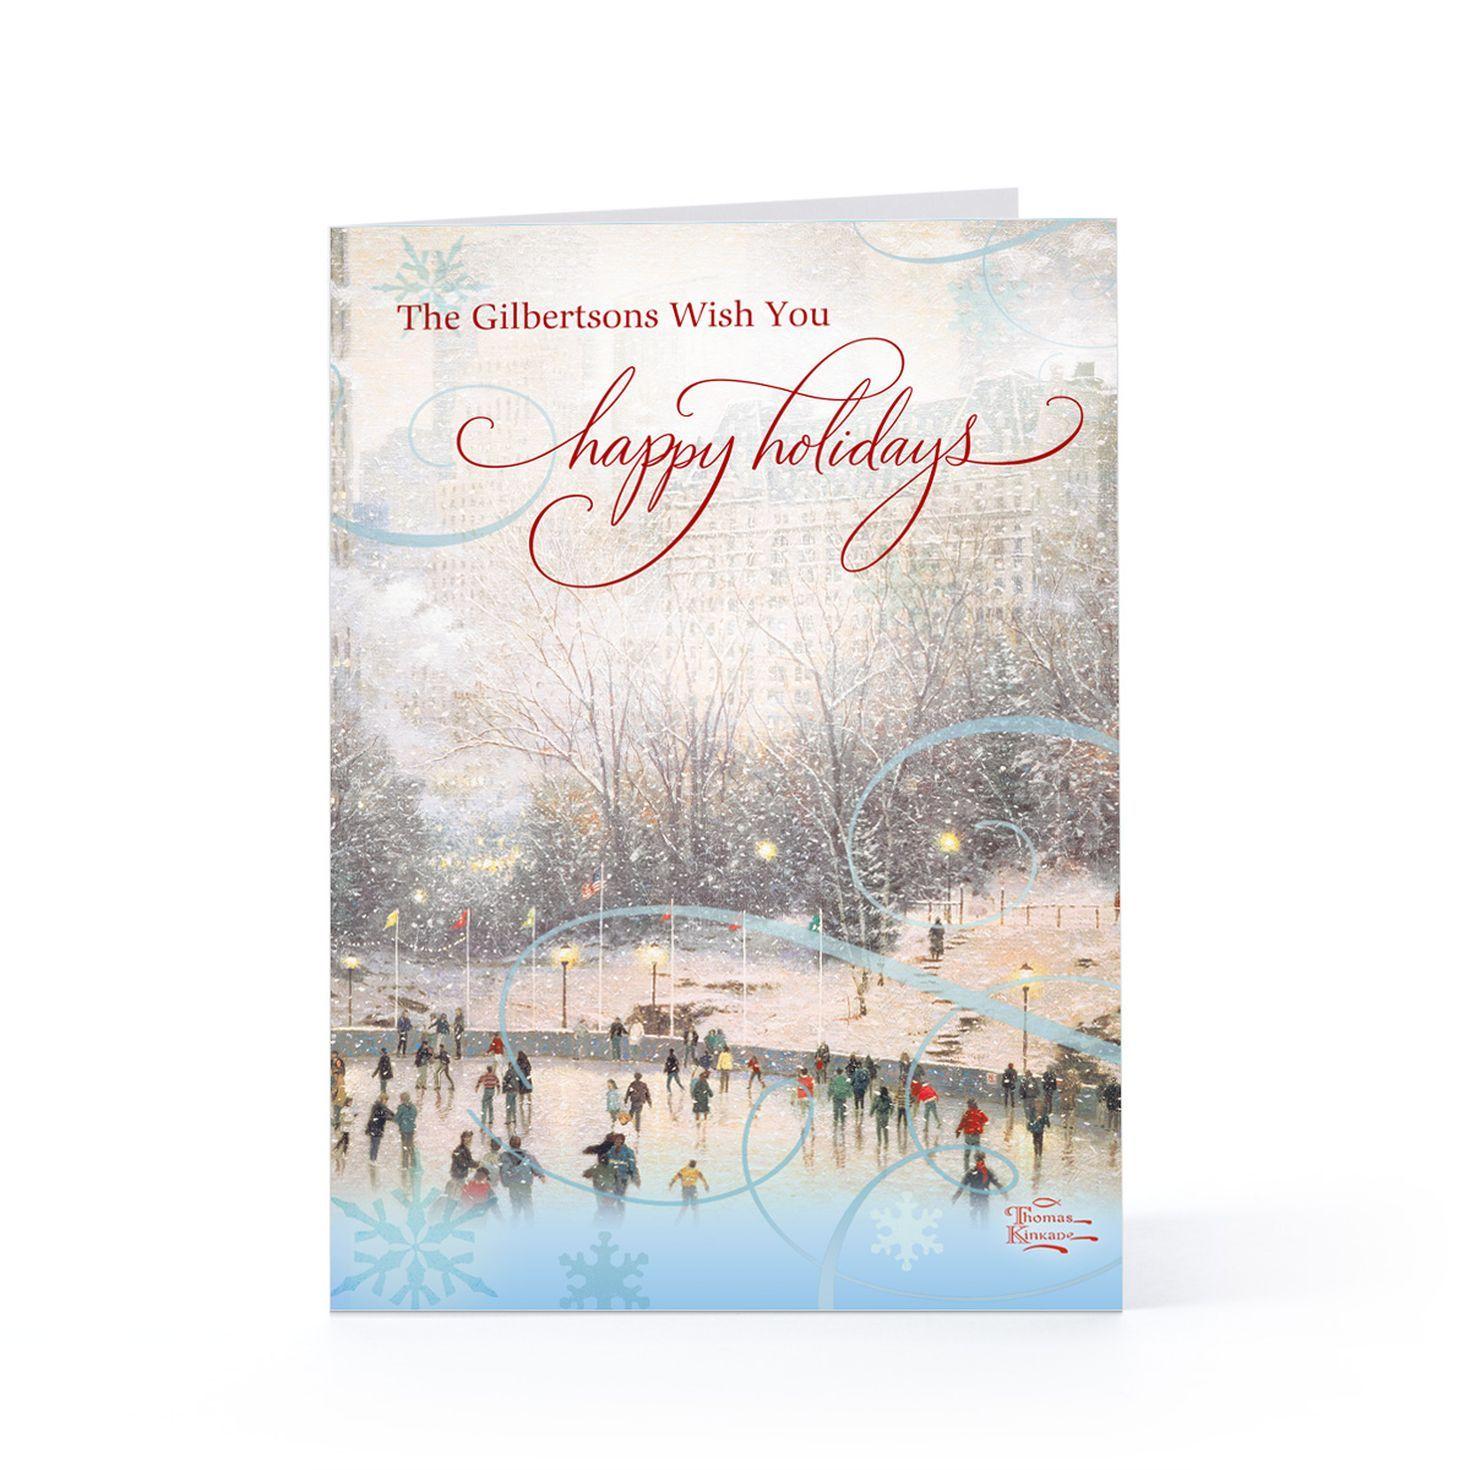 HallmarkS Holiday Greeting Cards With Thomas KinkadeS Artwork